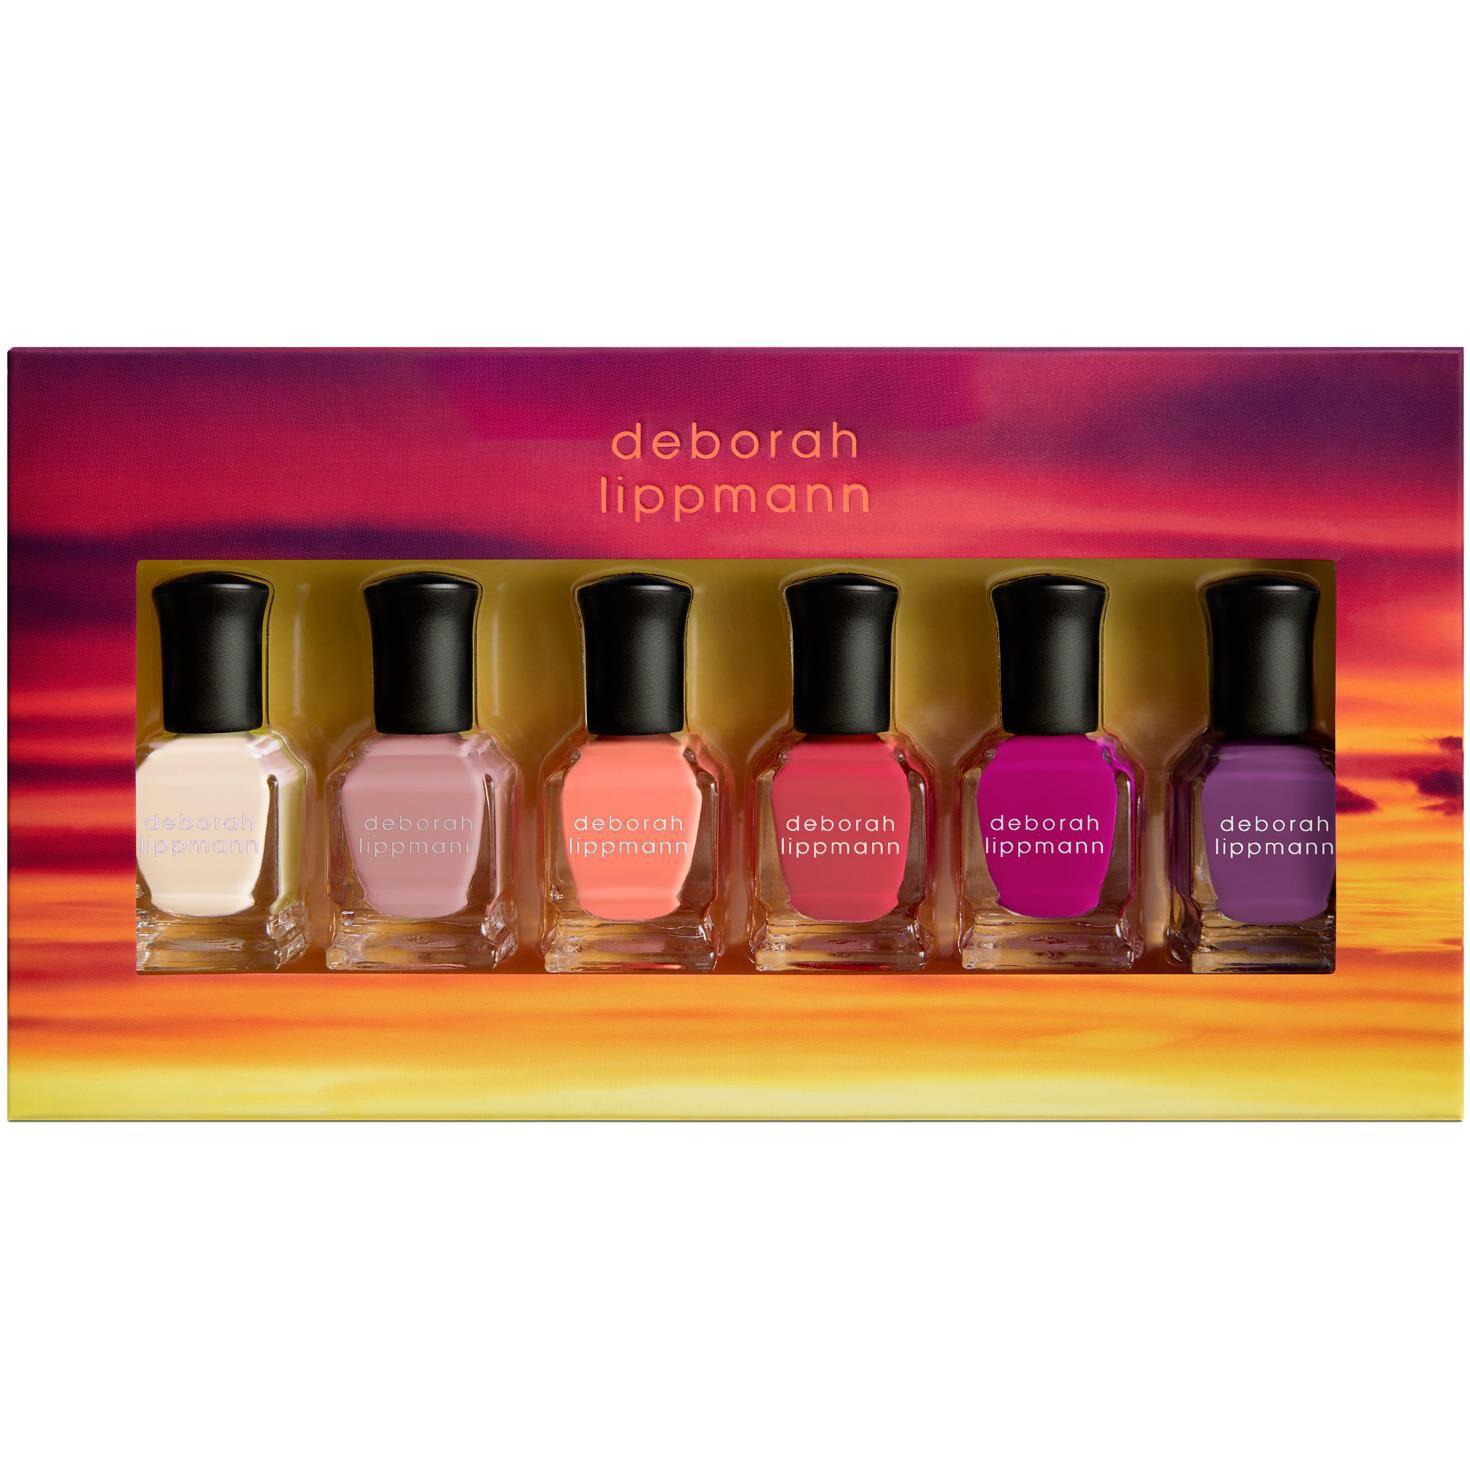 Sunrise Sunset Deborah Lippmann Nail Polish, Set of 6 - Lips & Nails ...